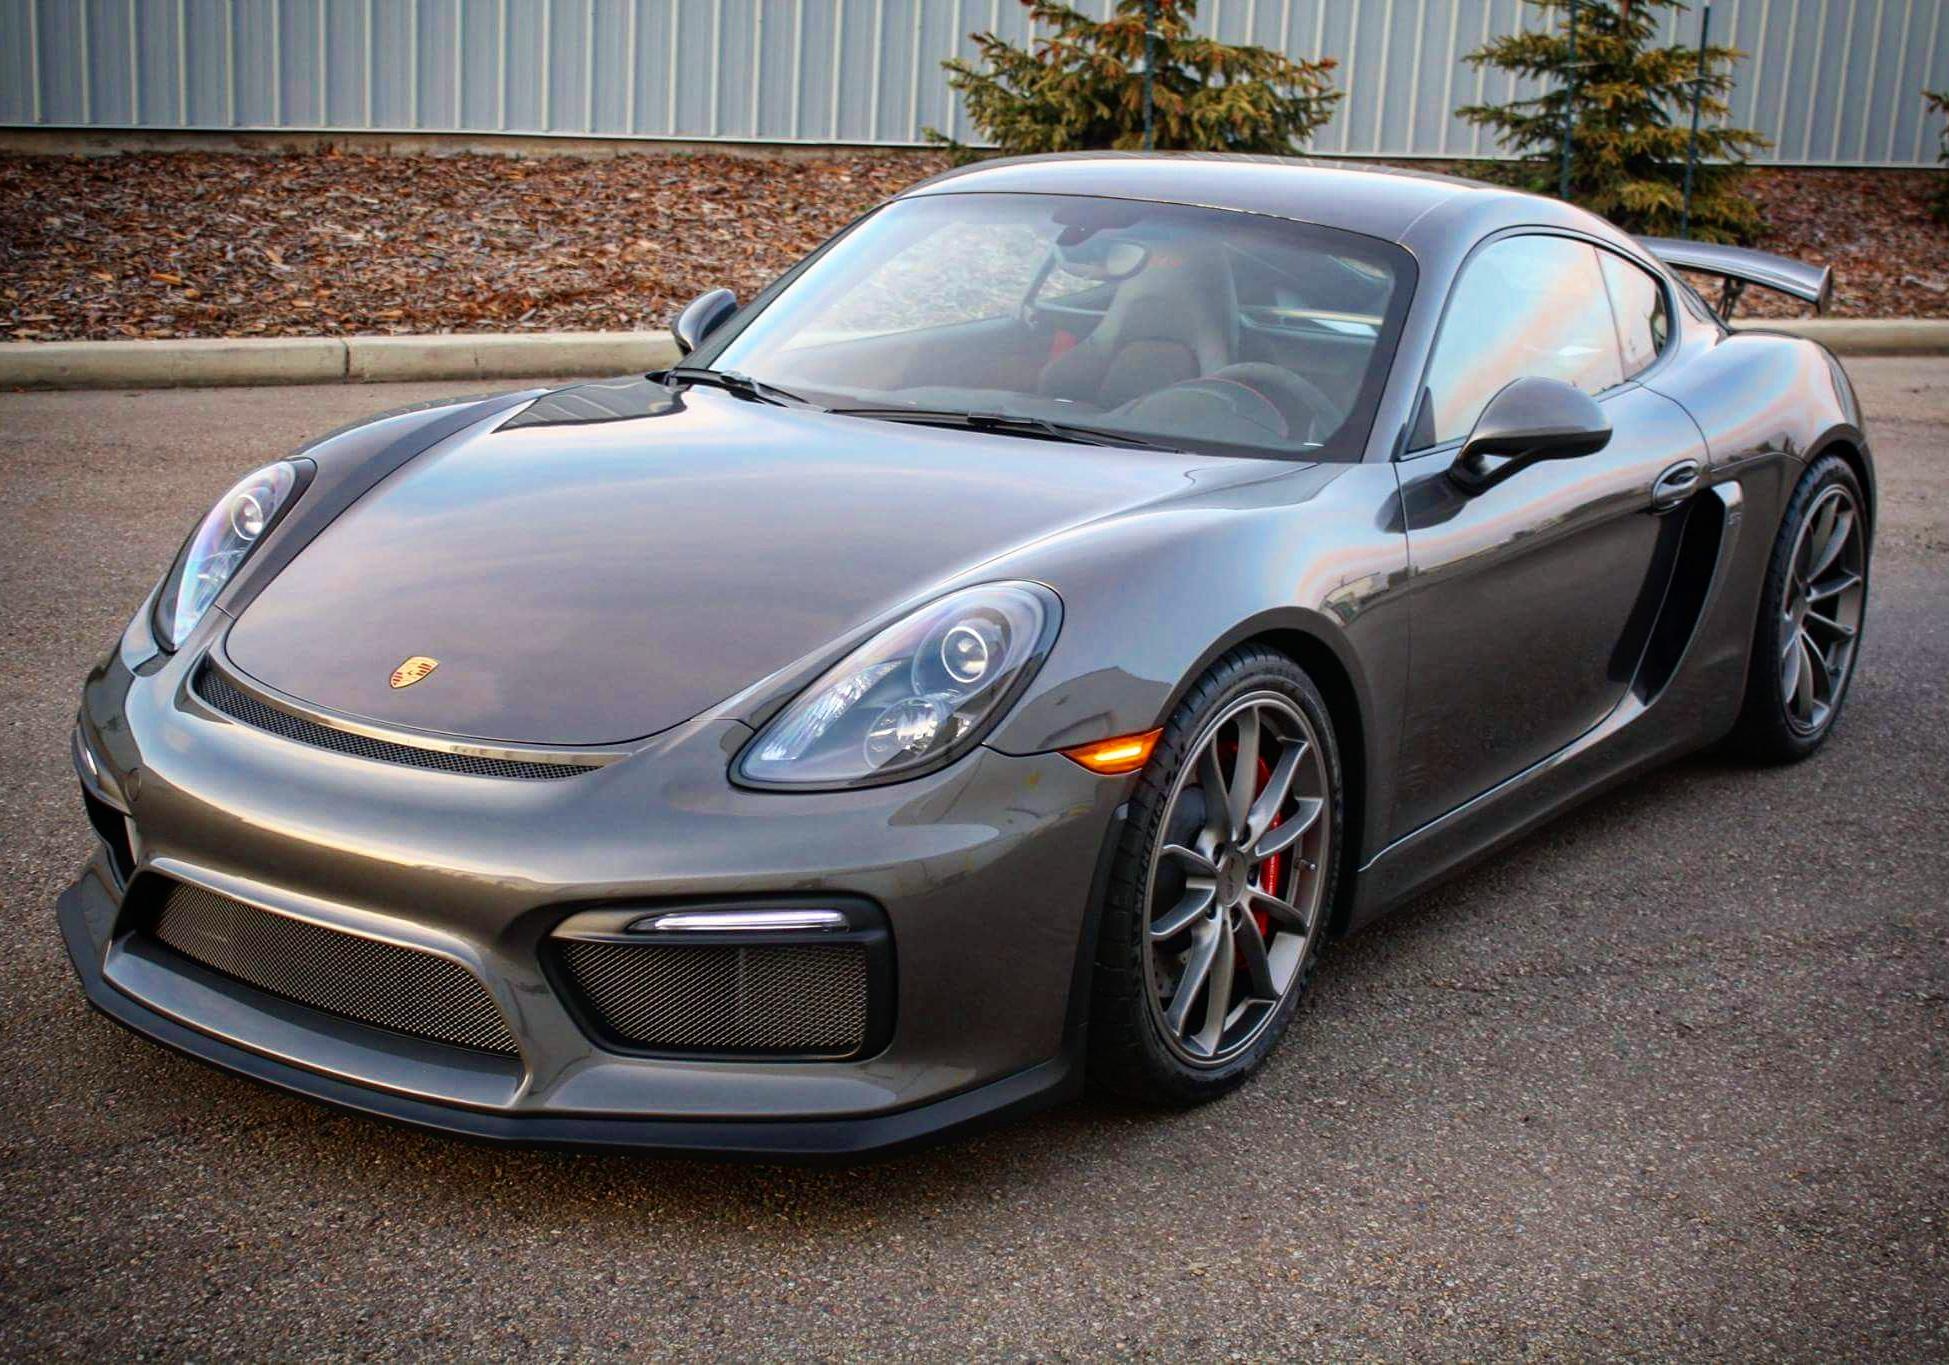 GT4 Porsche Presidential Exterior Detail